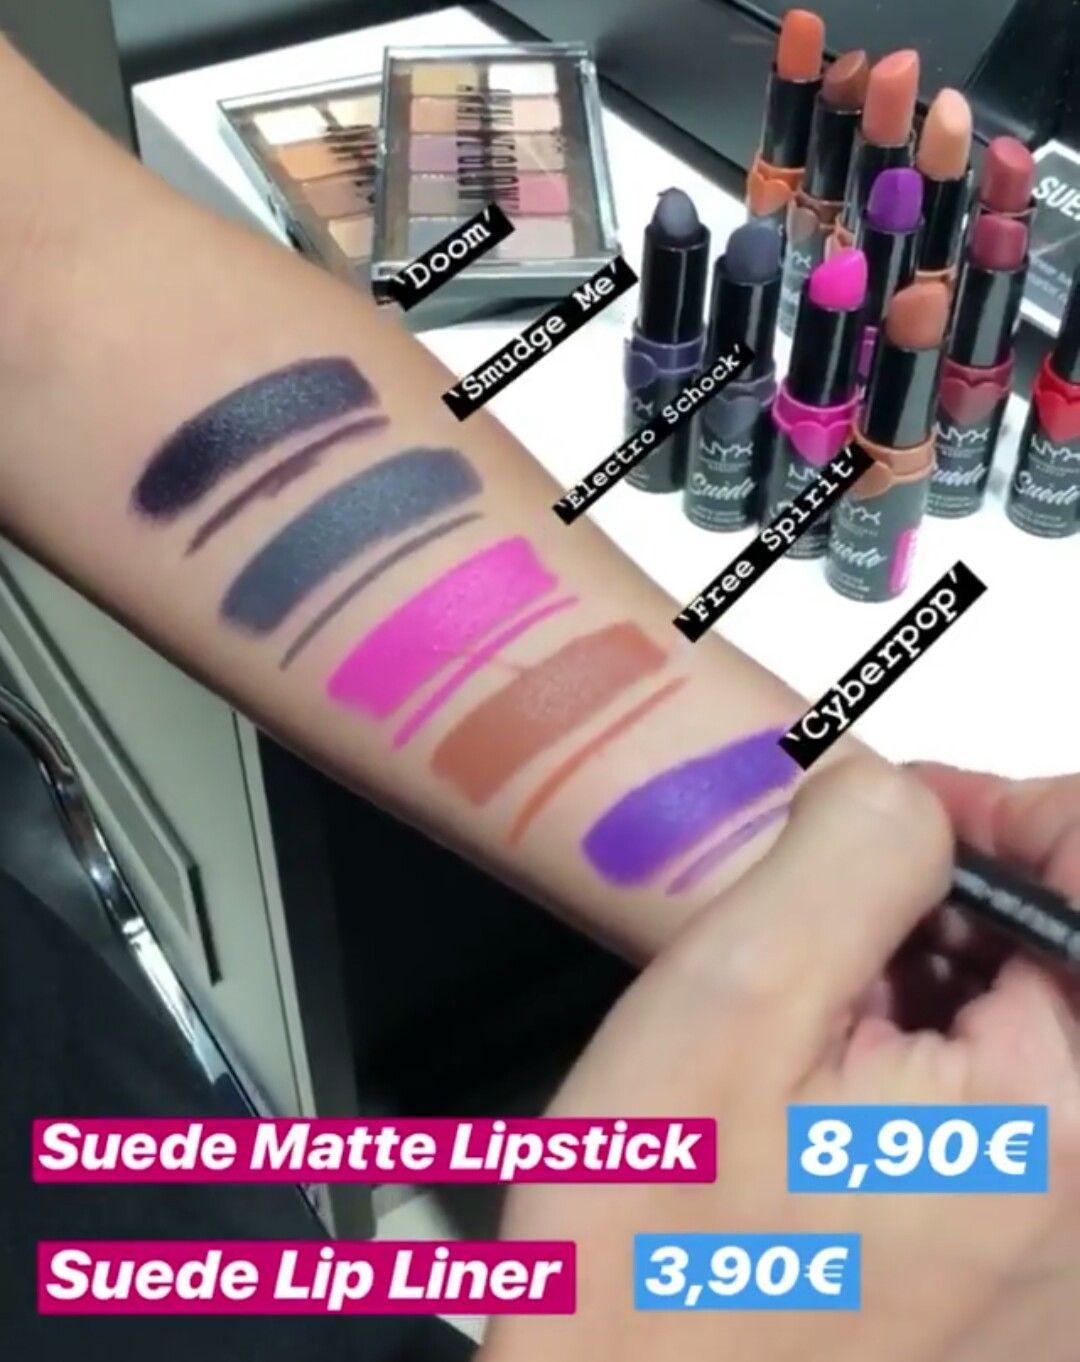 Nyx Suede Matte Lipsticks Swatches Nyx Lips In 2019 Lipstick